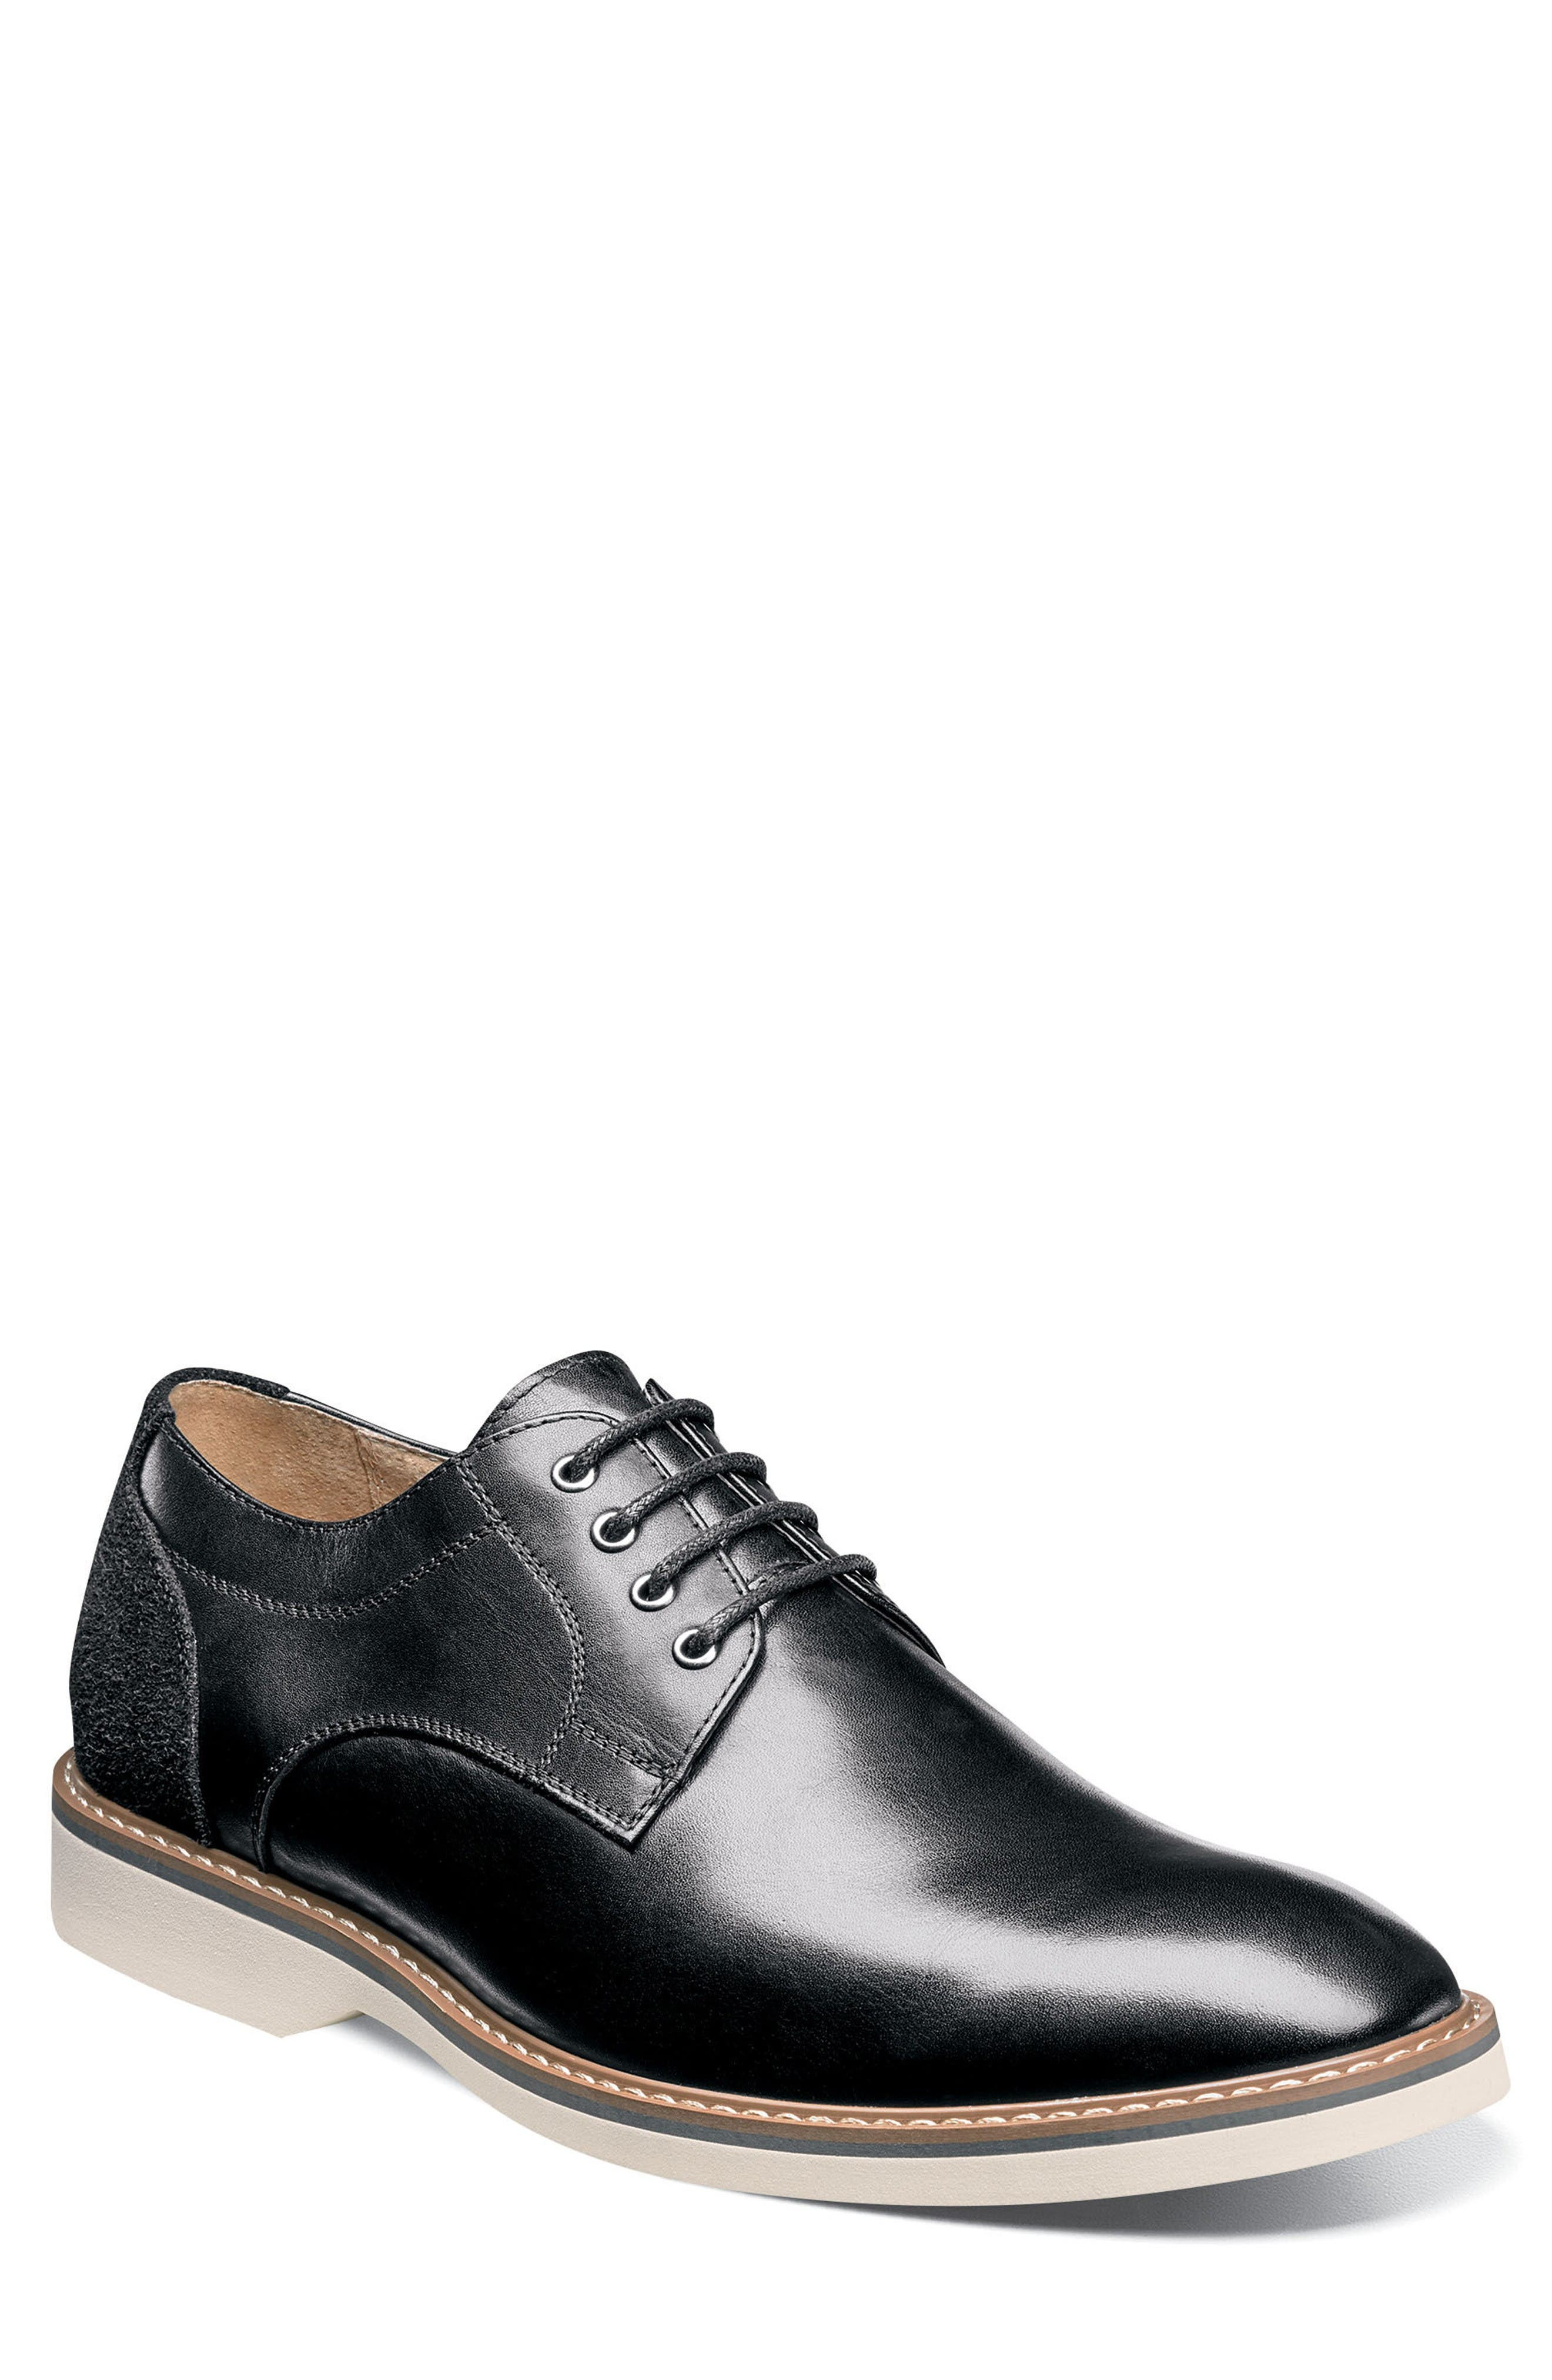 Main Image - Florsheim Union Buck Shoe (Men)